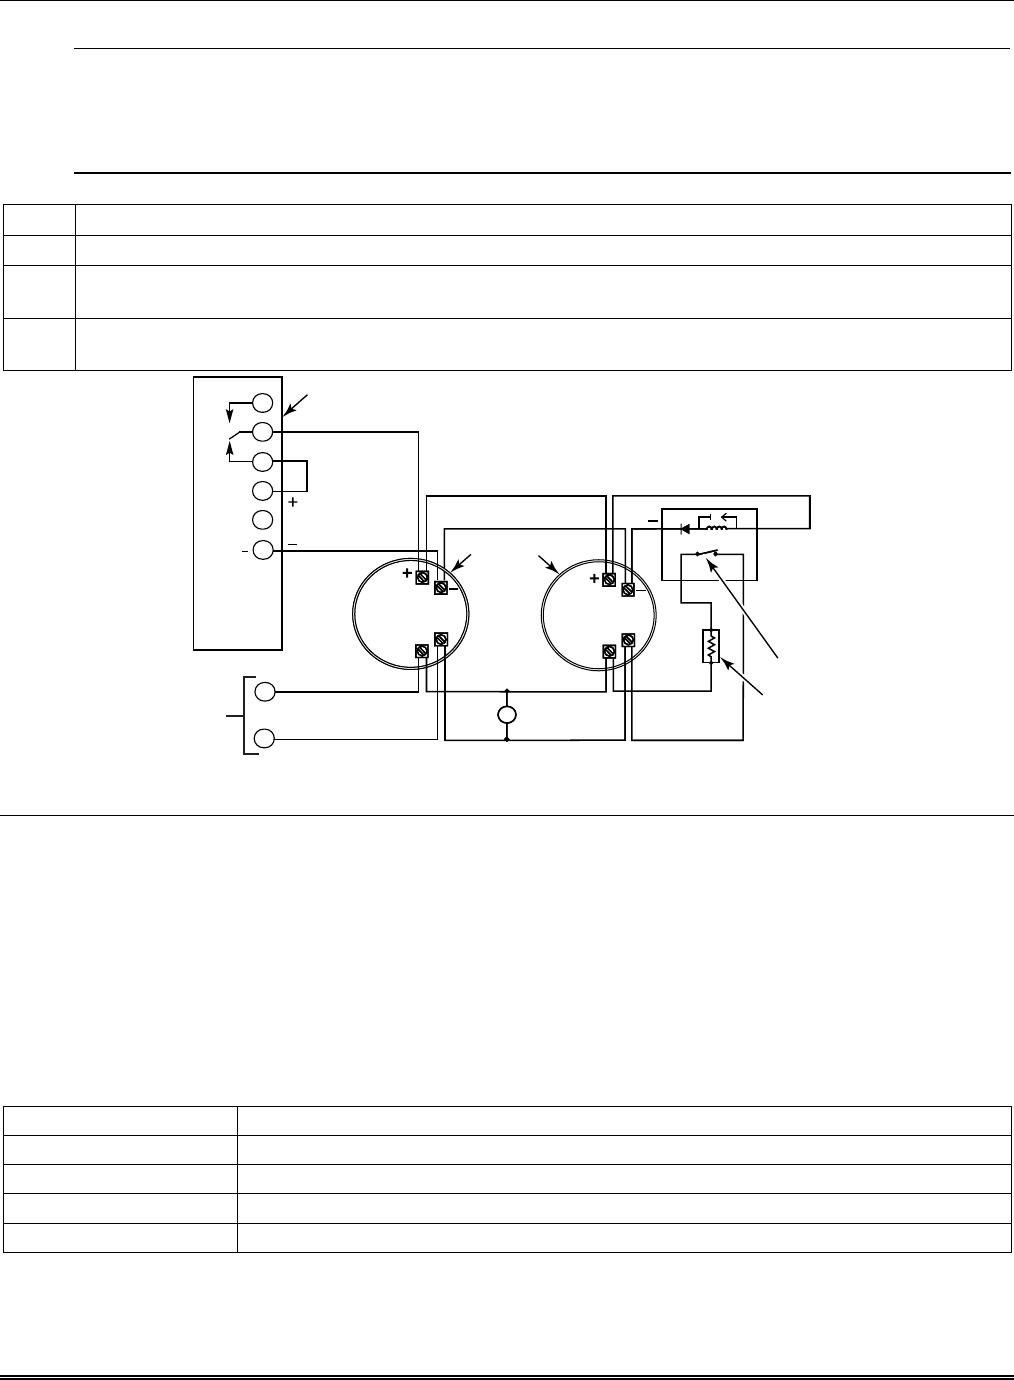 Vista 128fb Vplex Wiring Diagram And Schematics Ademco 128bp Diagrams Zone Expander Source 128fbpn Installation Setup Guide